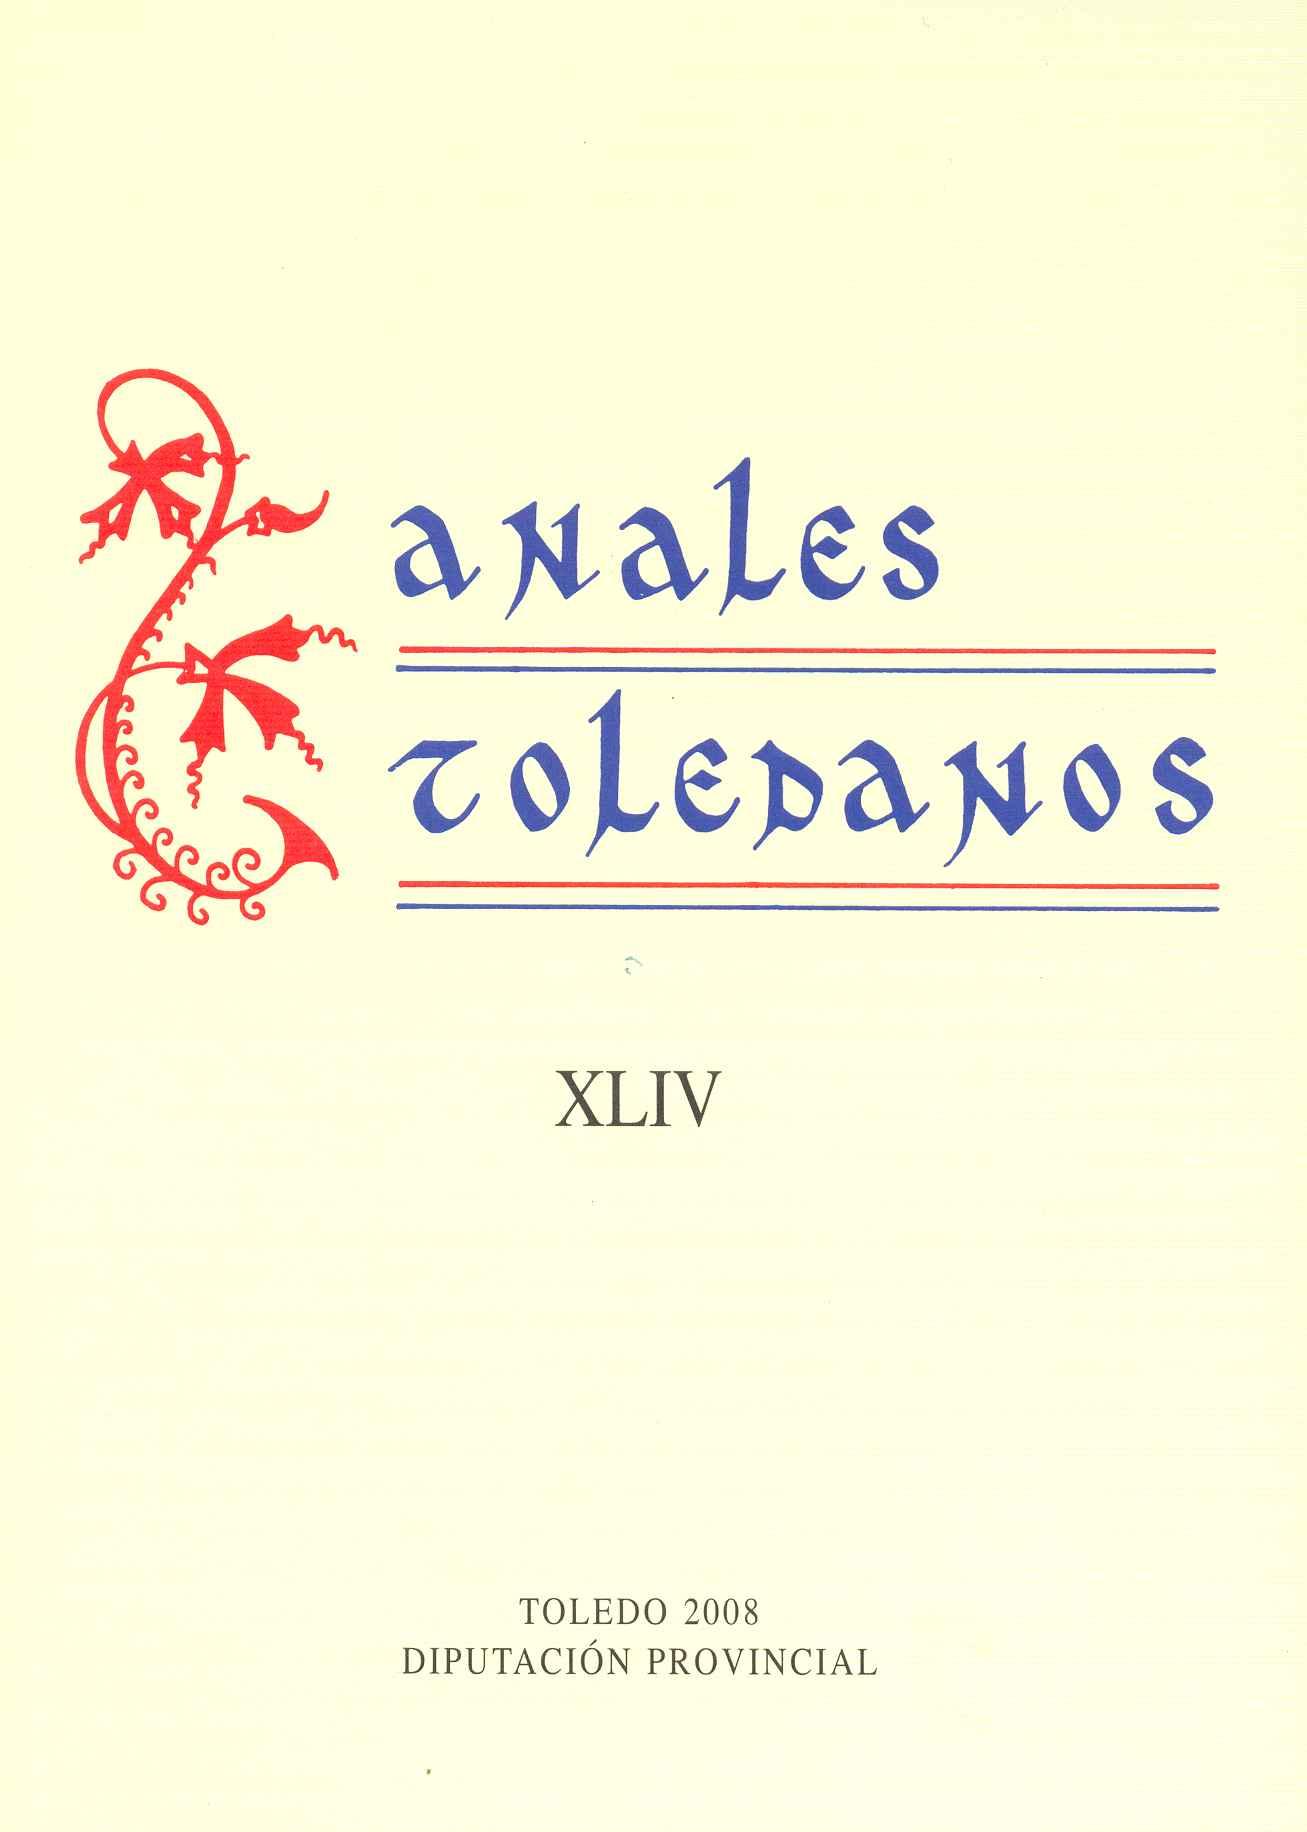 Anales Toledanos XLIV